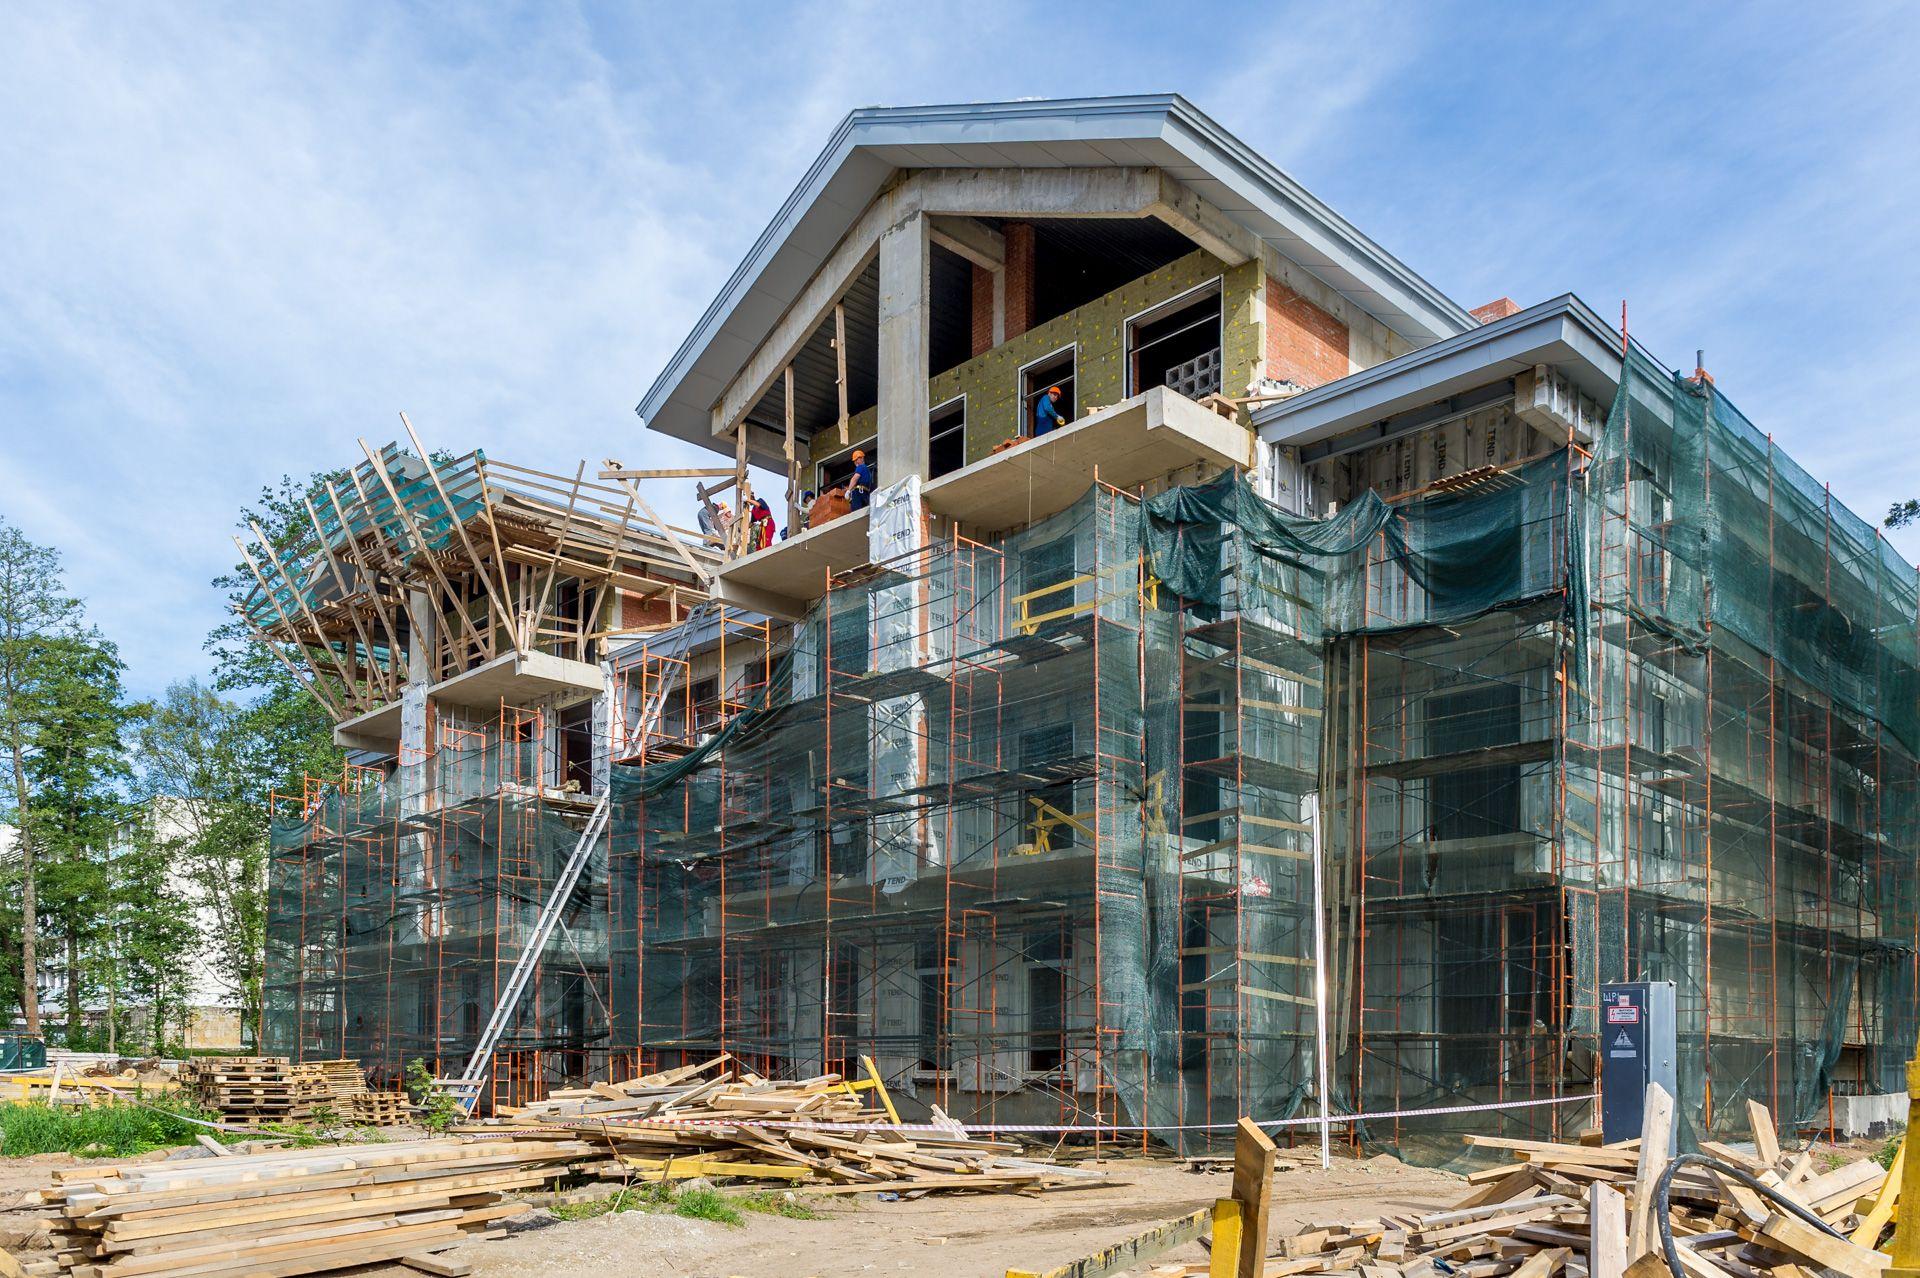 Июль 2016 #musthave #недвижимость #апартаменты #luxury #строительство #musthave 4 нед.